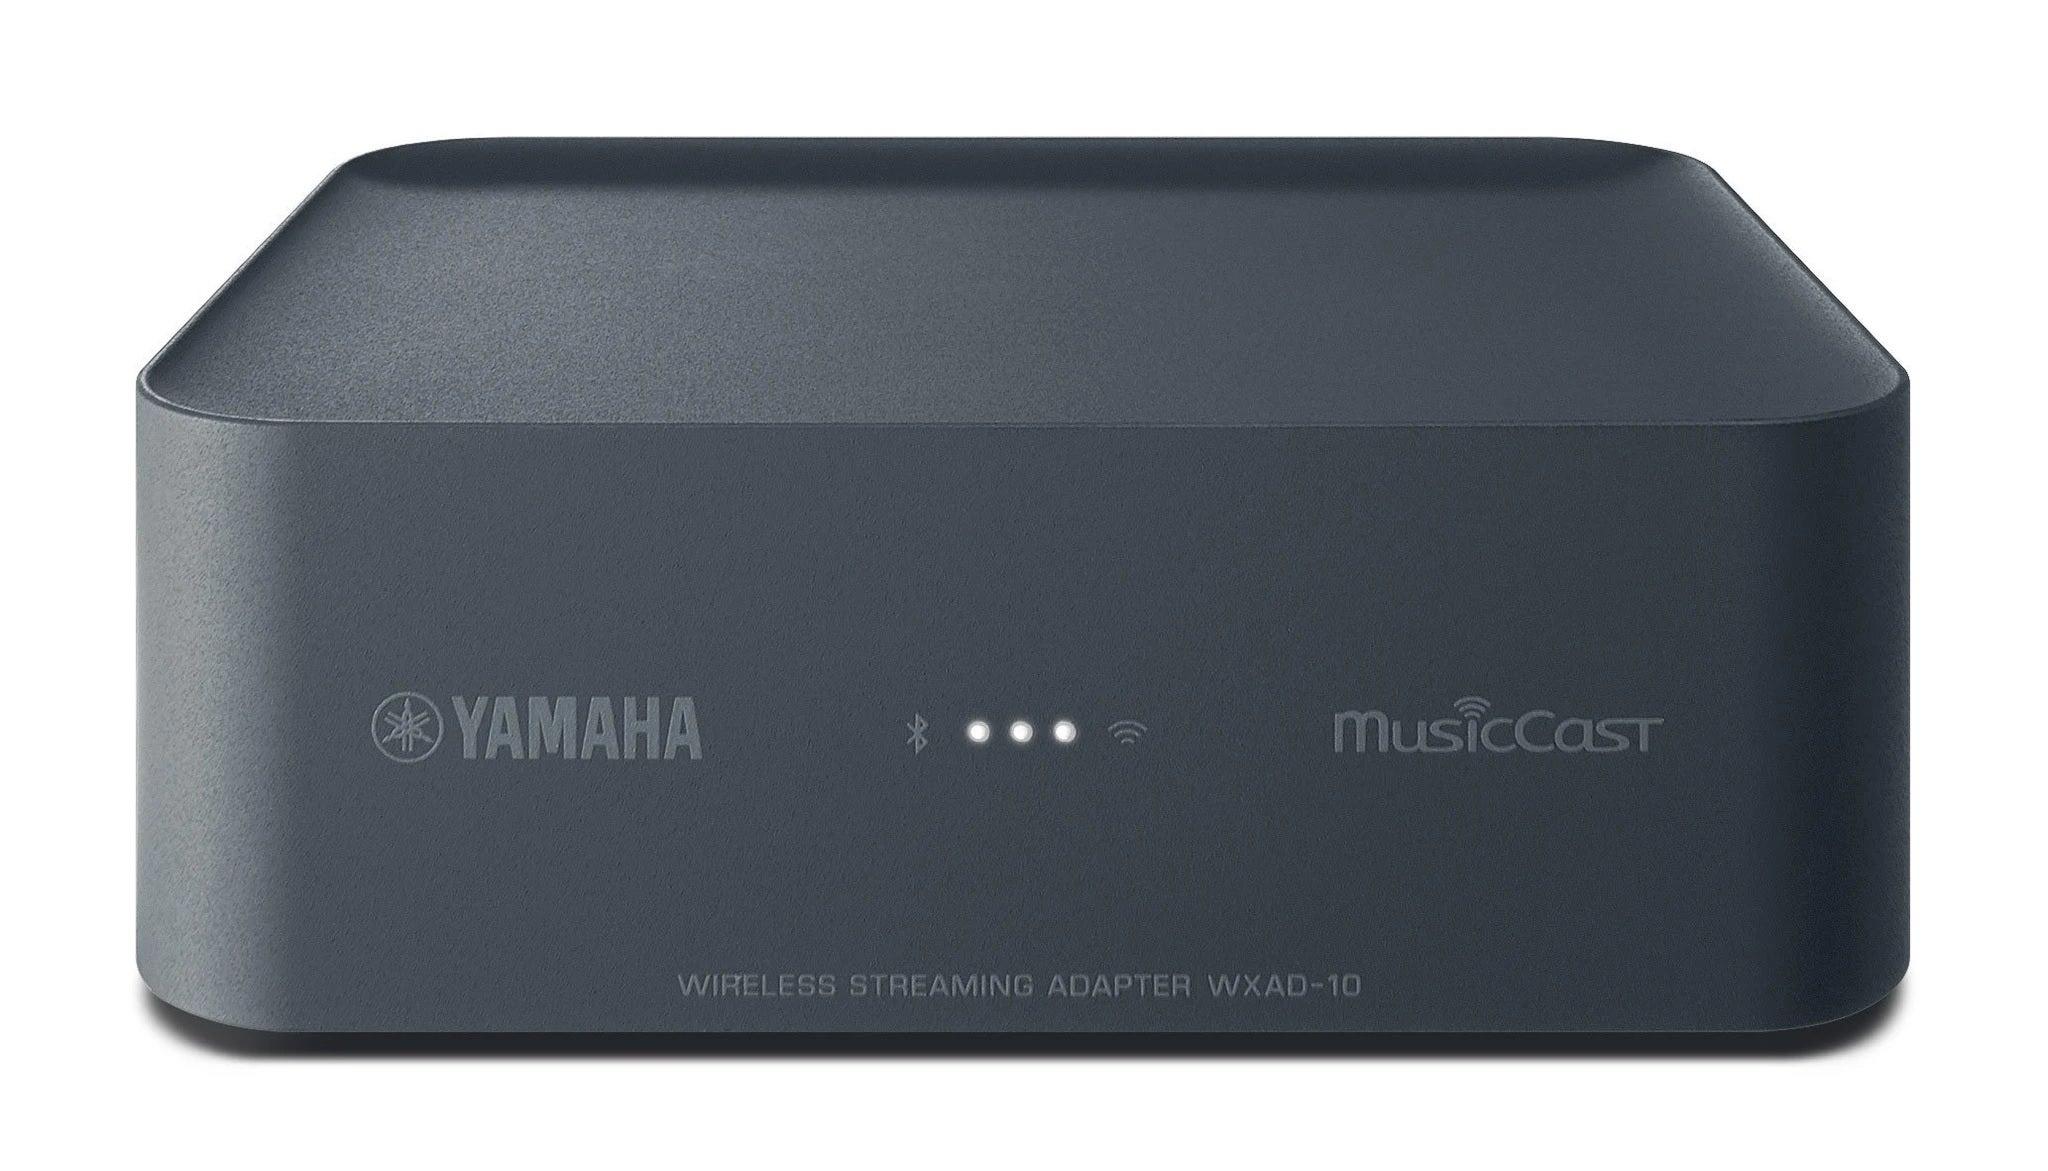 Yamaha MusicCast WXAD10 Media Streaming Device